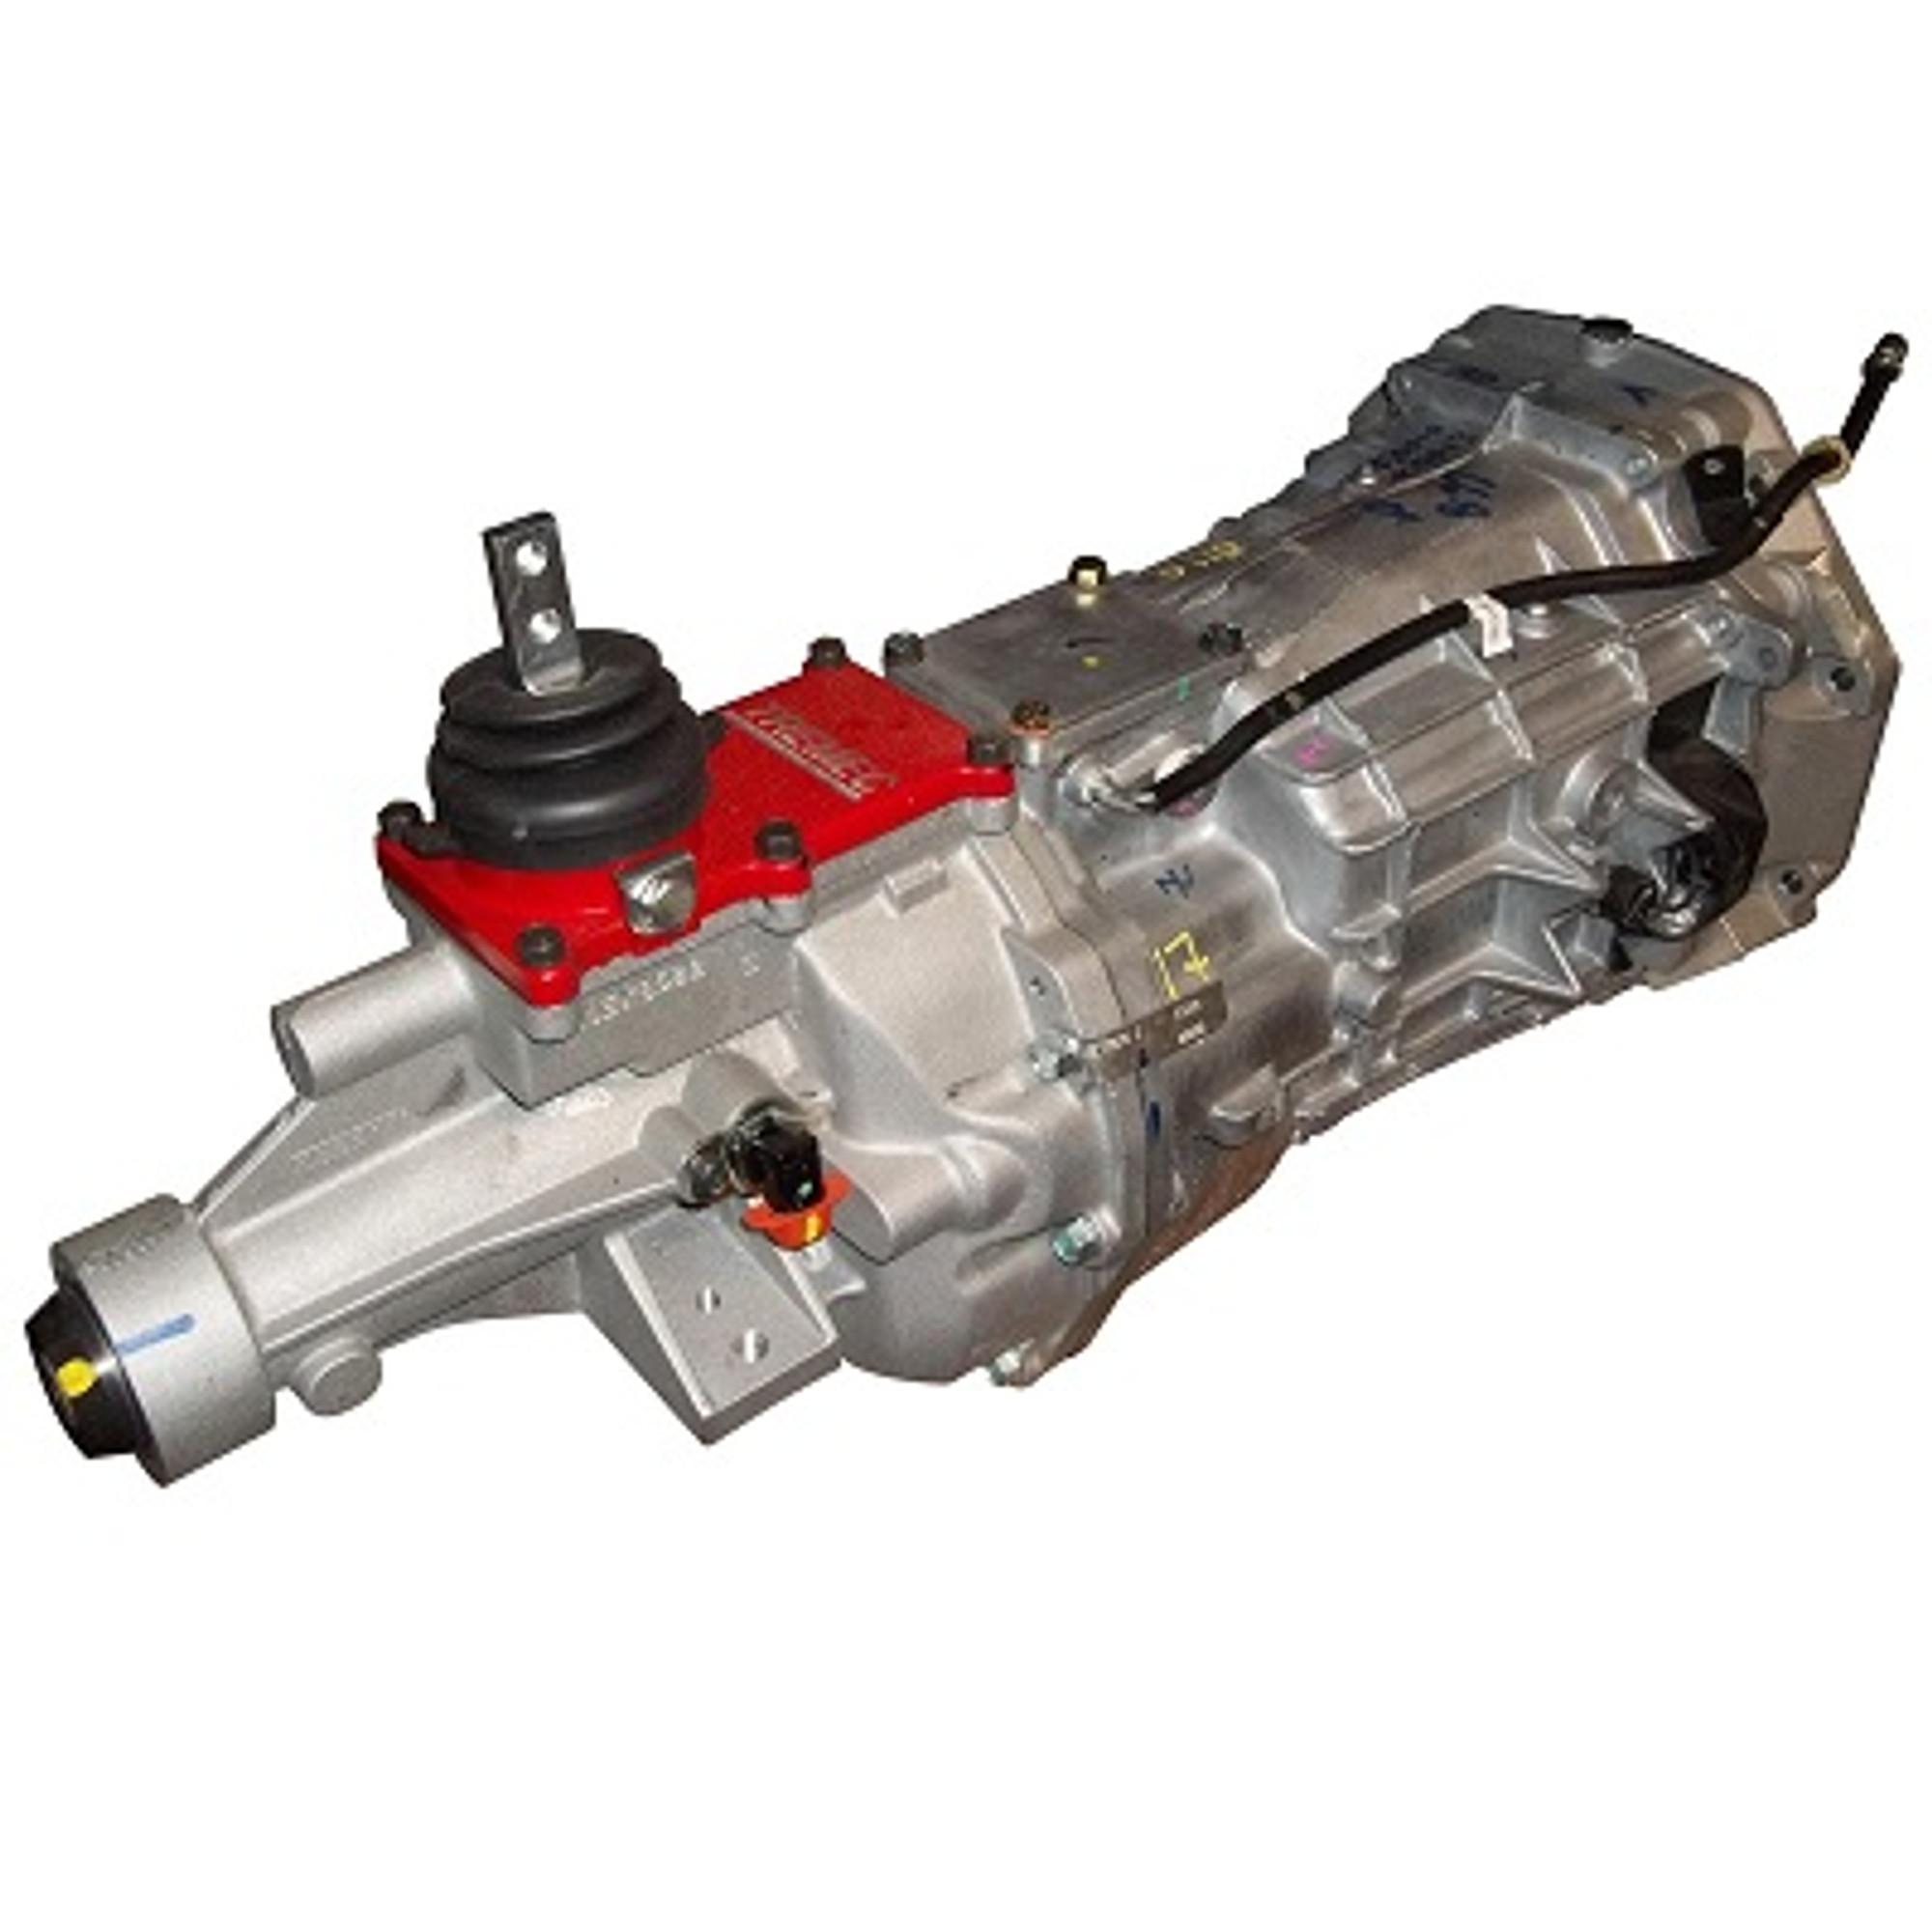 6 Speed Transmission >> Tremec T56 Magnum Manual Transmission 6 Speed 1 1 8 26 Spline With